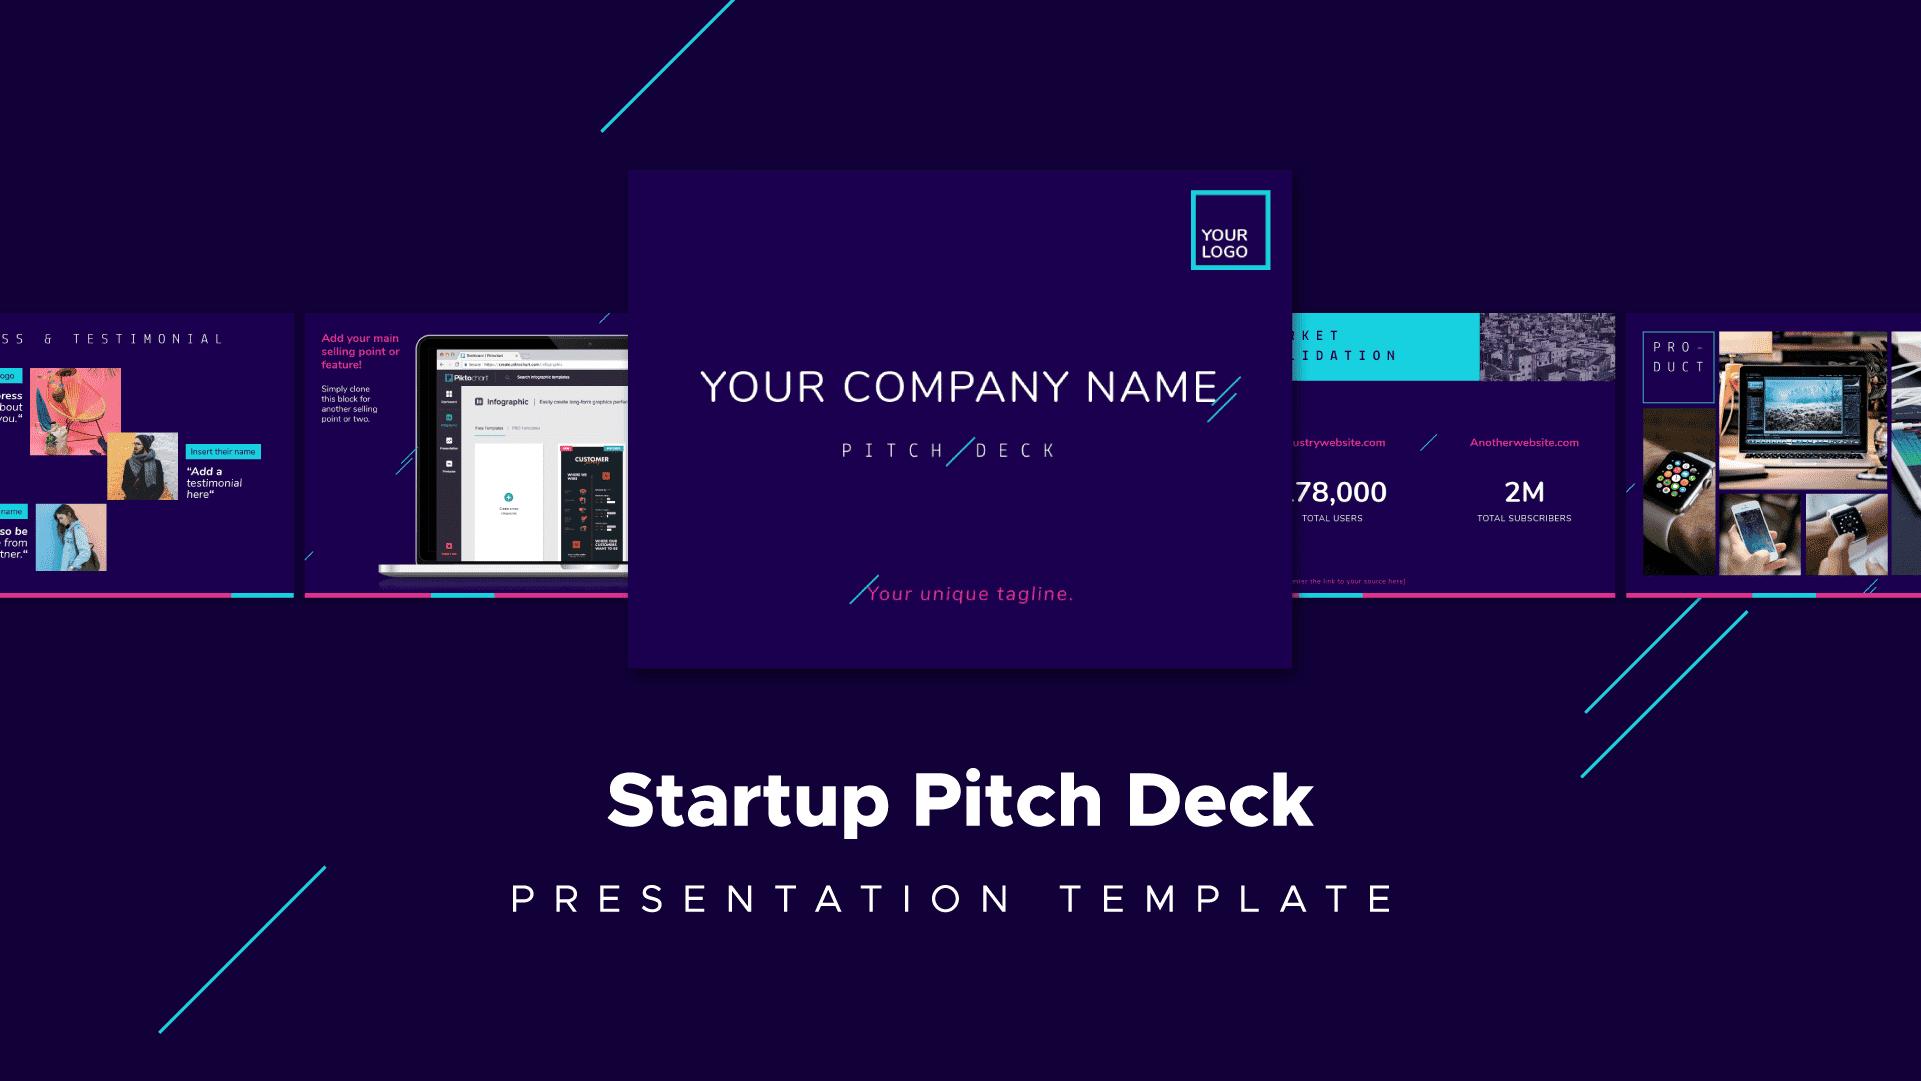 startup pitch deck template, presentation template